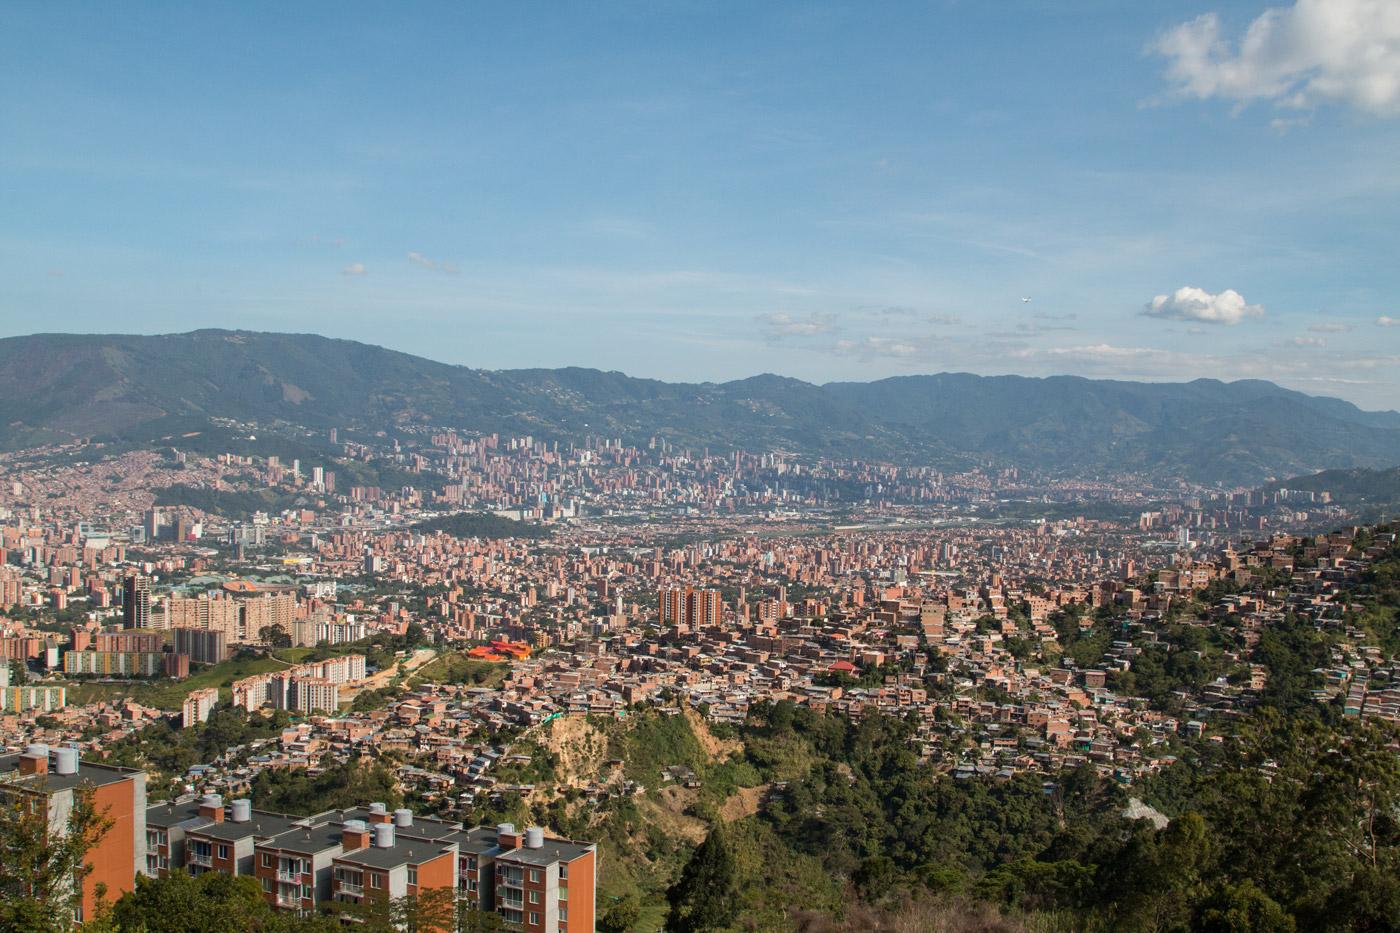 The city of Medellín